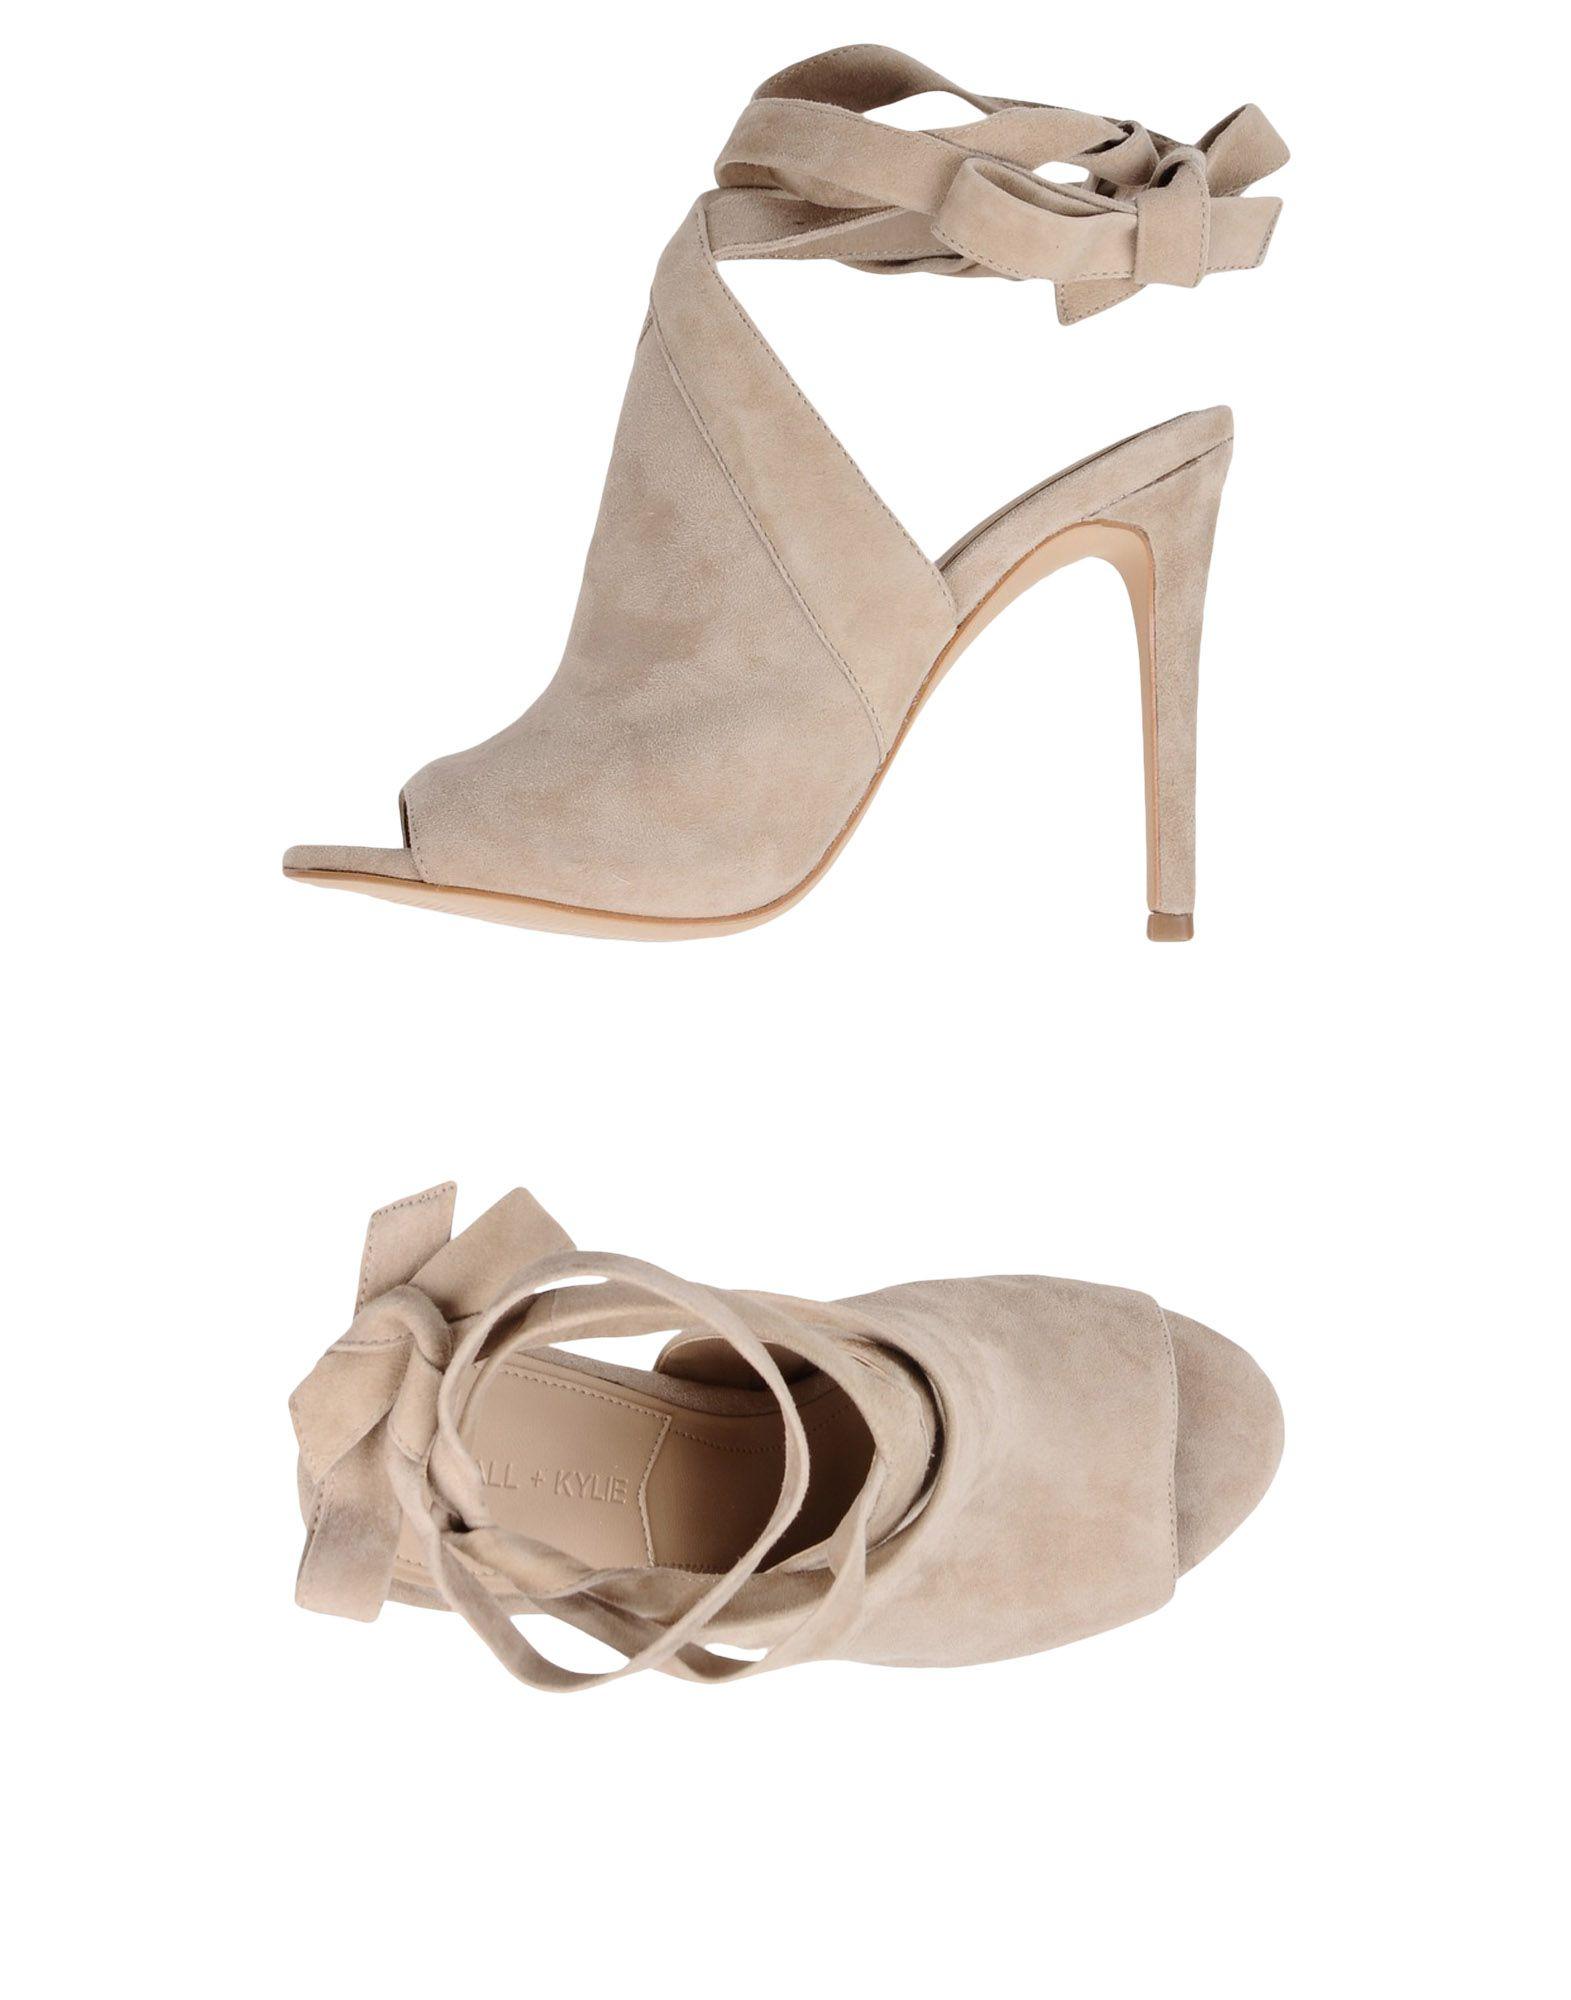 Kendall + Kylie Sandalen Neue Damen  11337947JP Neue Sandalen Schuhe 24825c